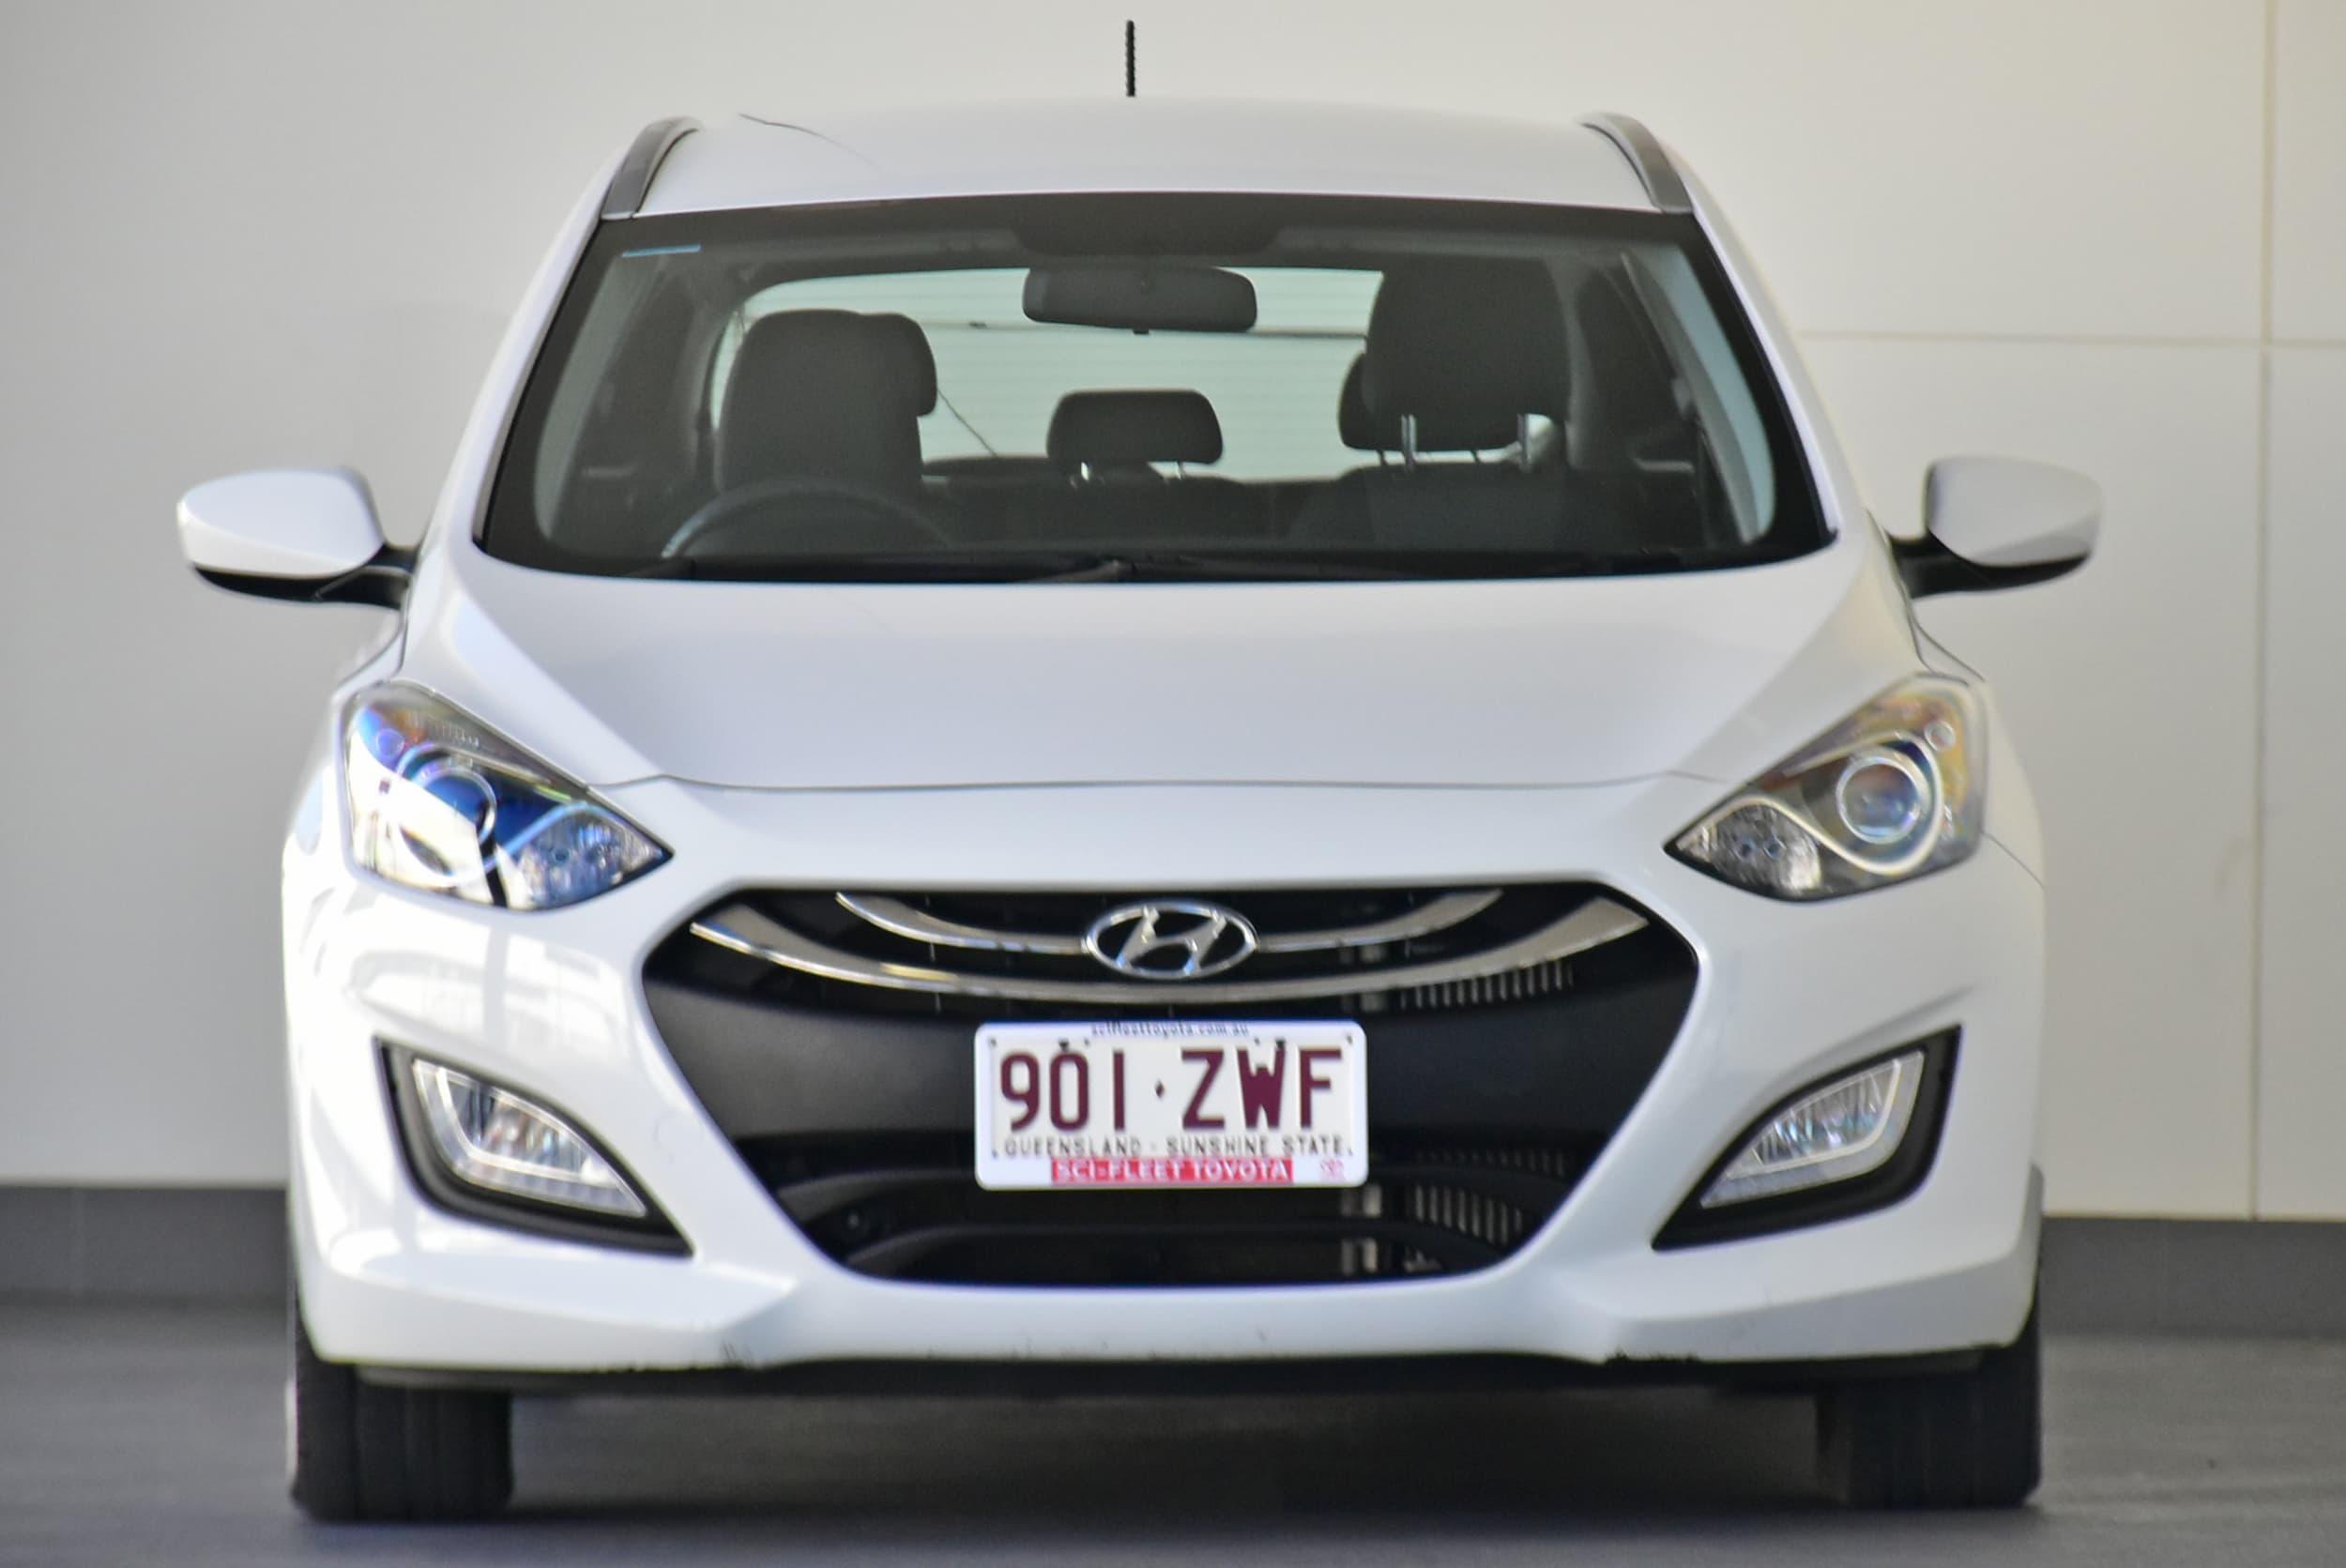 2014 Hyundai i30 Active Auto - image 2